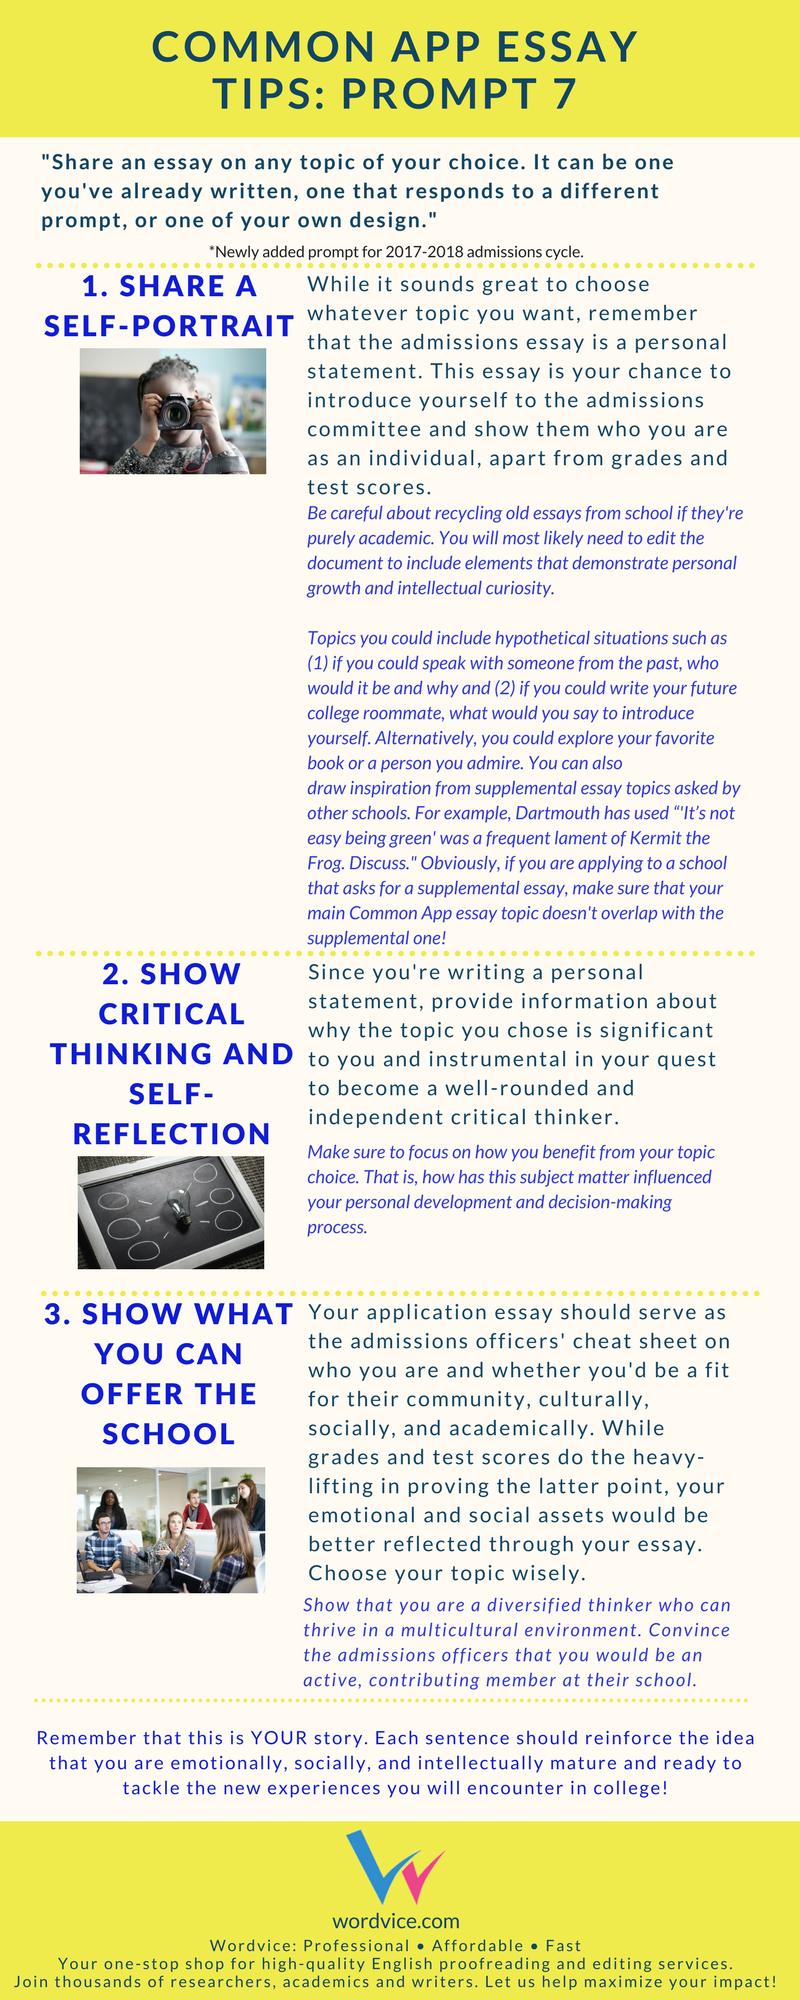 011 Common App Brainstormprompt Essay Questions Dreaded 2017 2017-18 Full